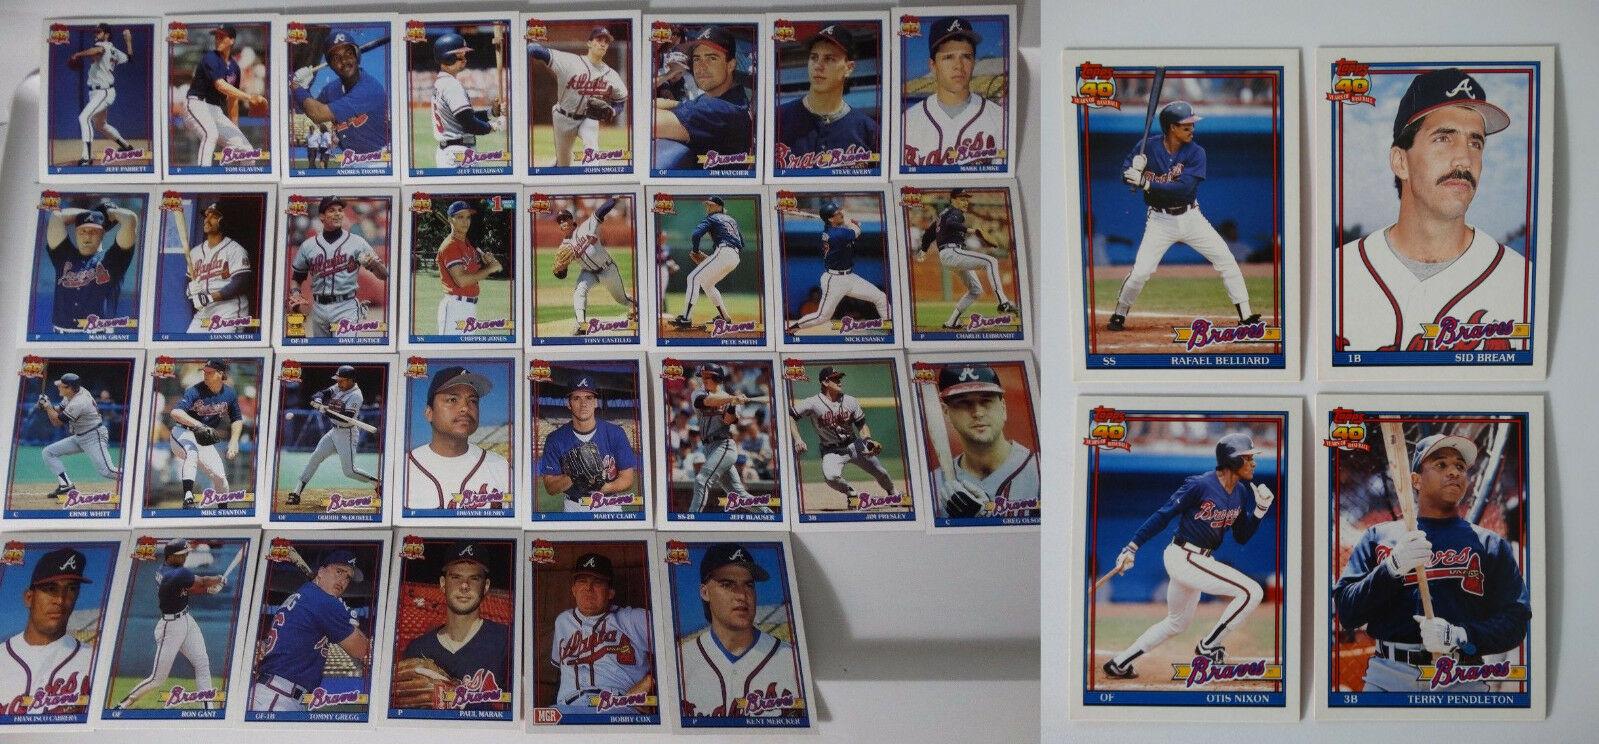 1991 Topps Atlanta Braves Team Set of 34 Baseball Cards With Traded